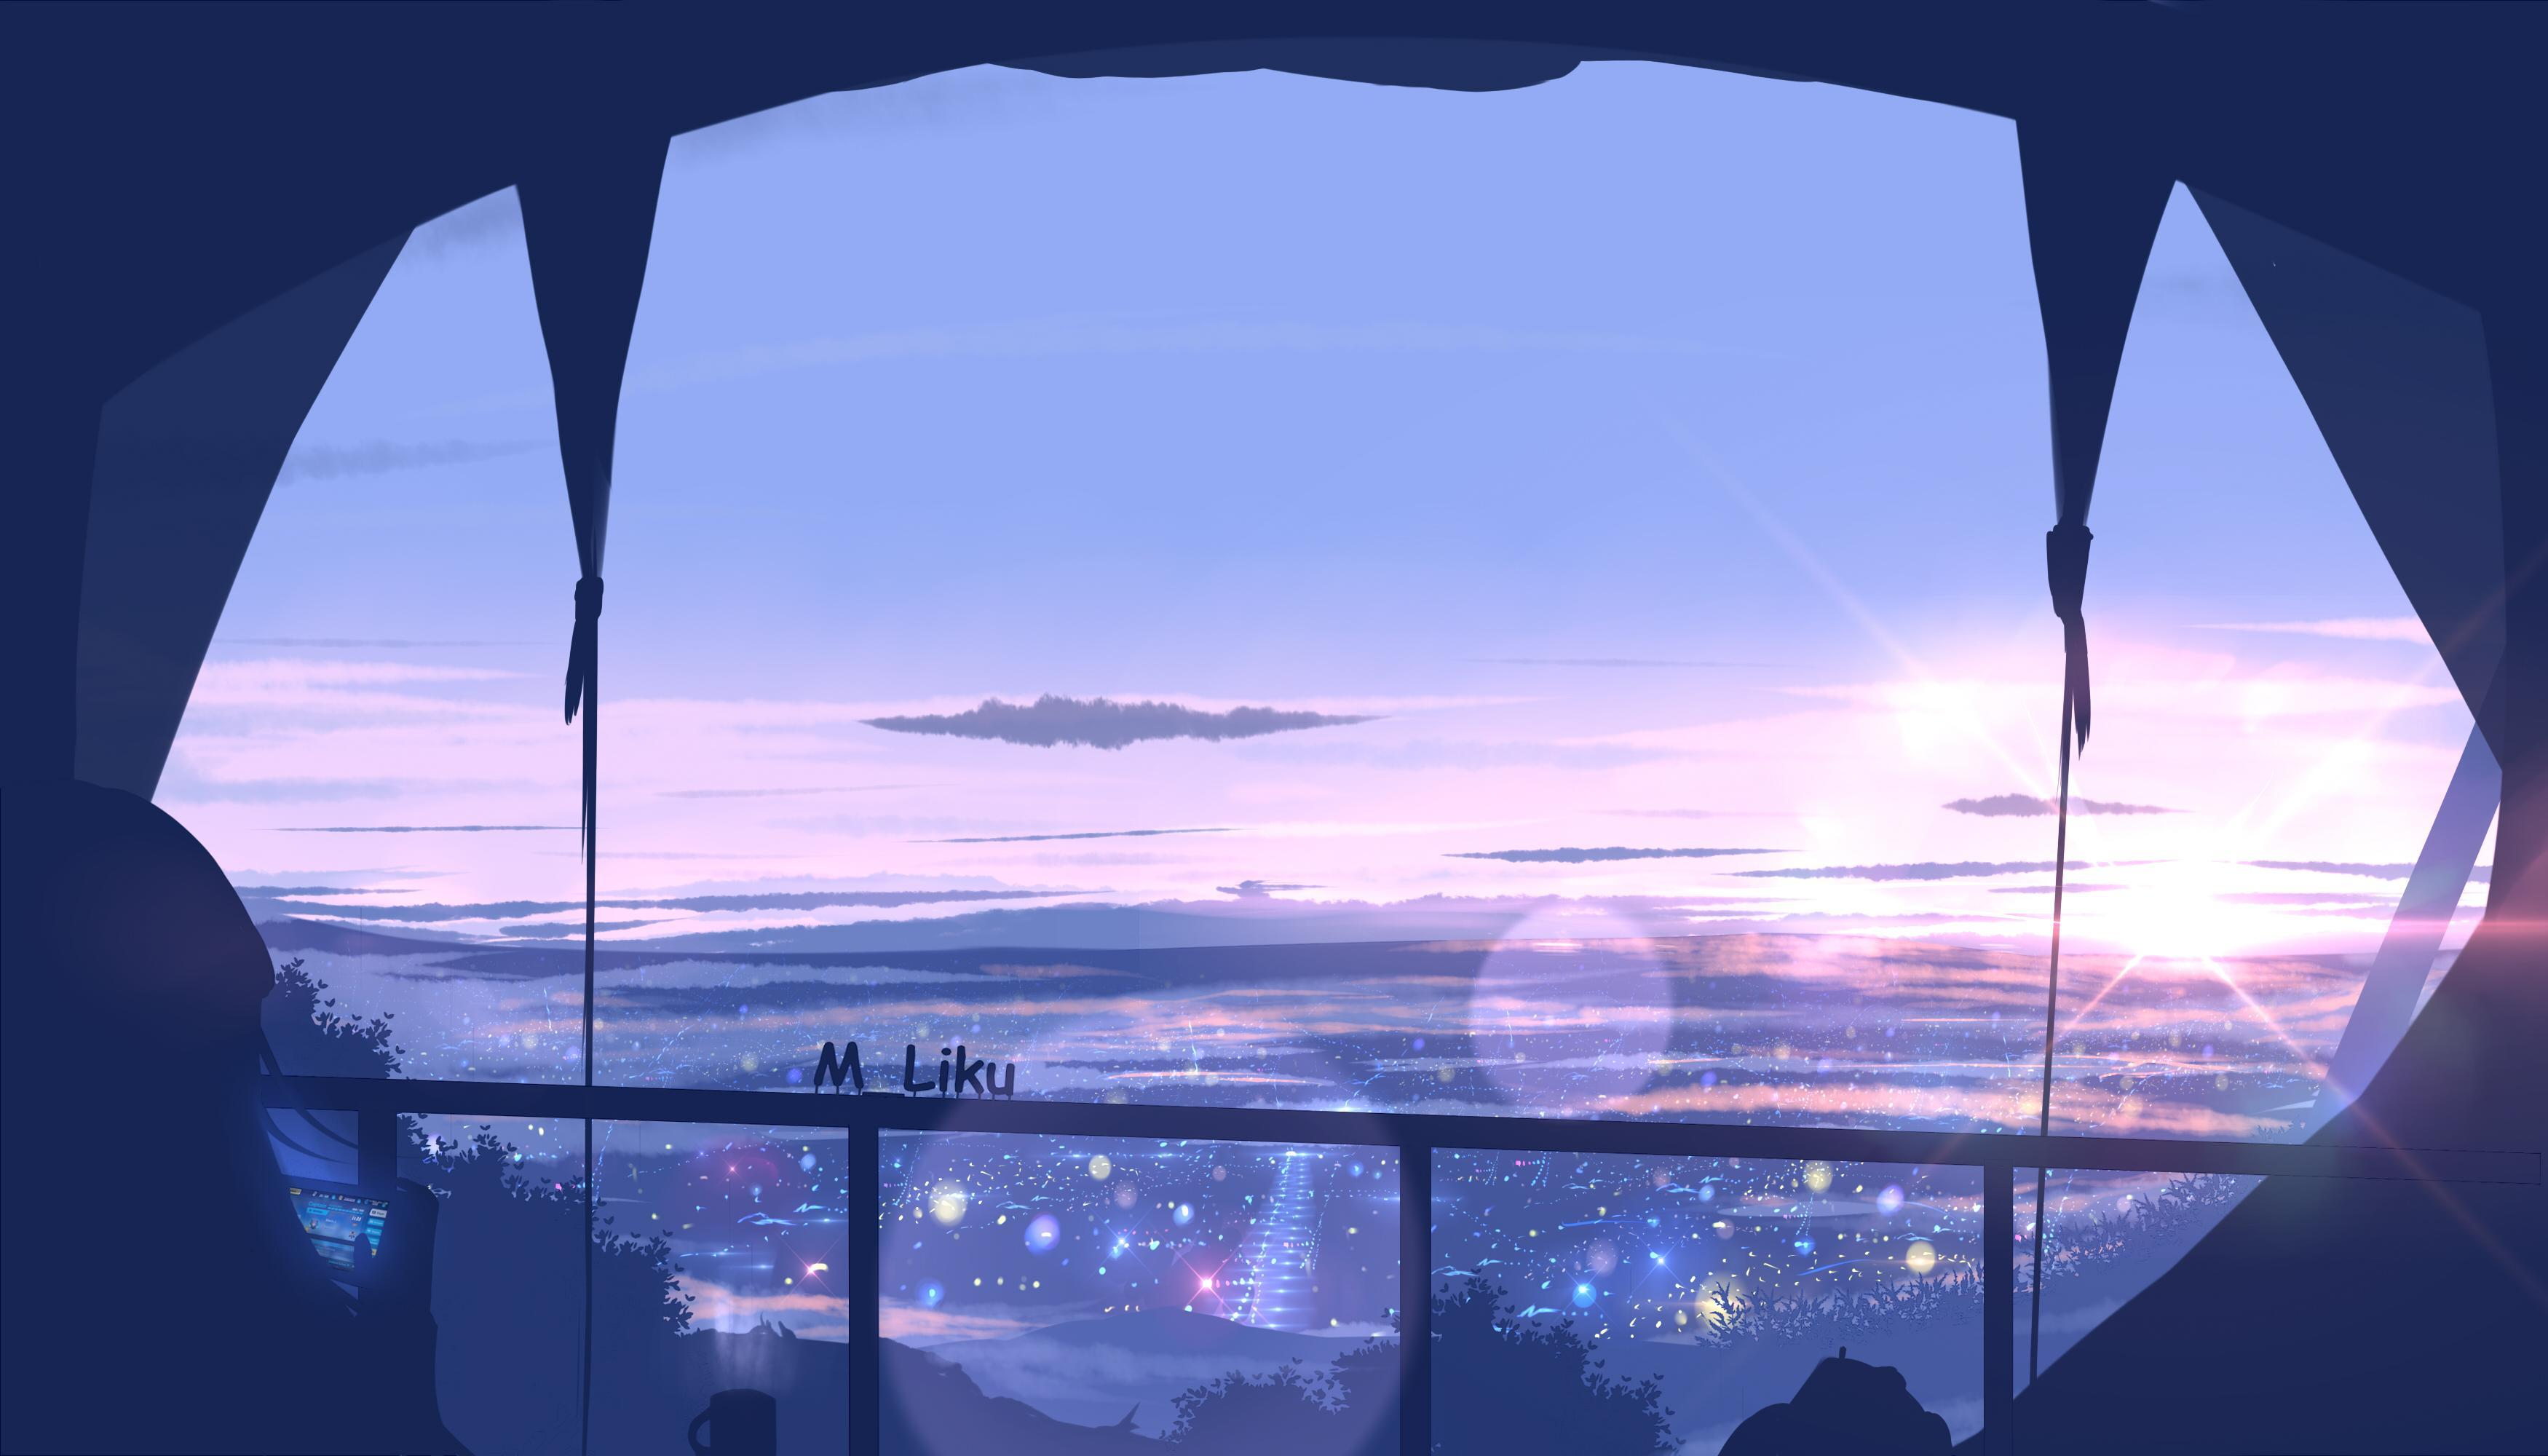 Anime Artwork Landscape 4k Wallpapers - Wallpaper Cave